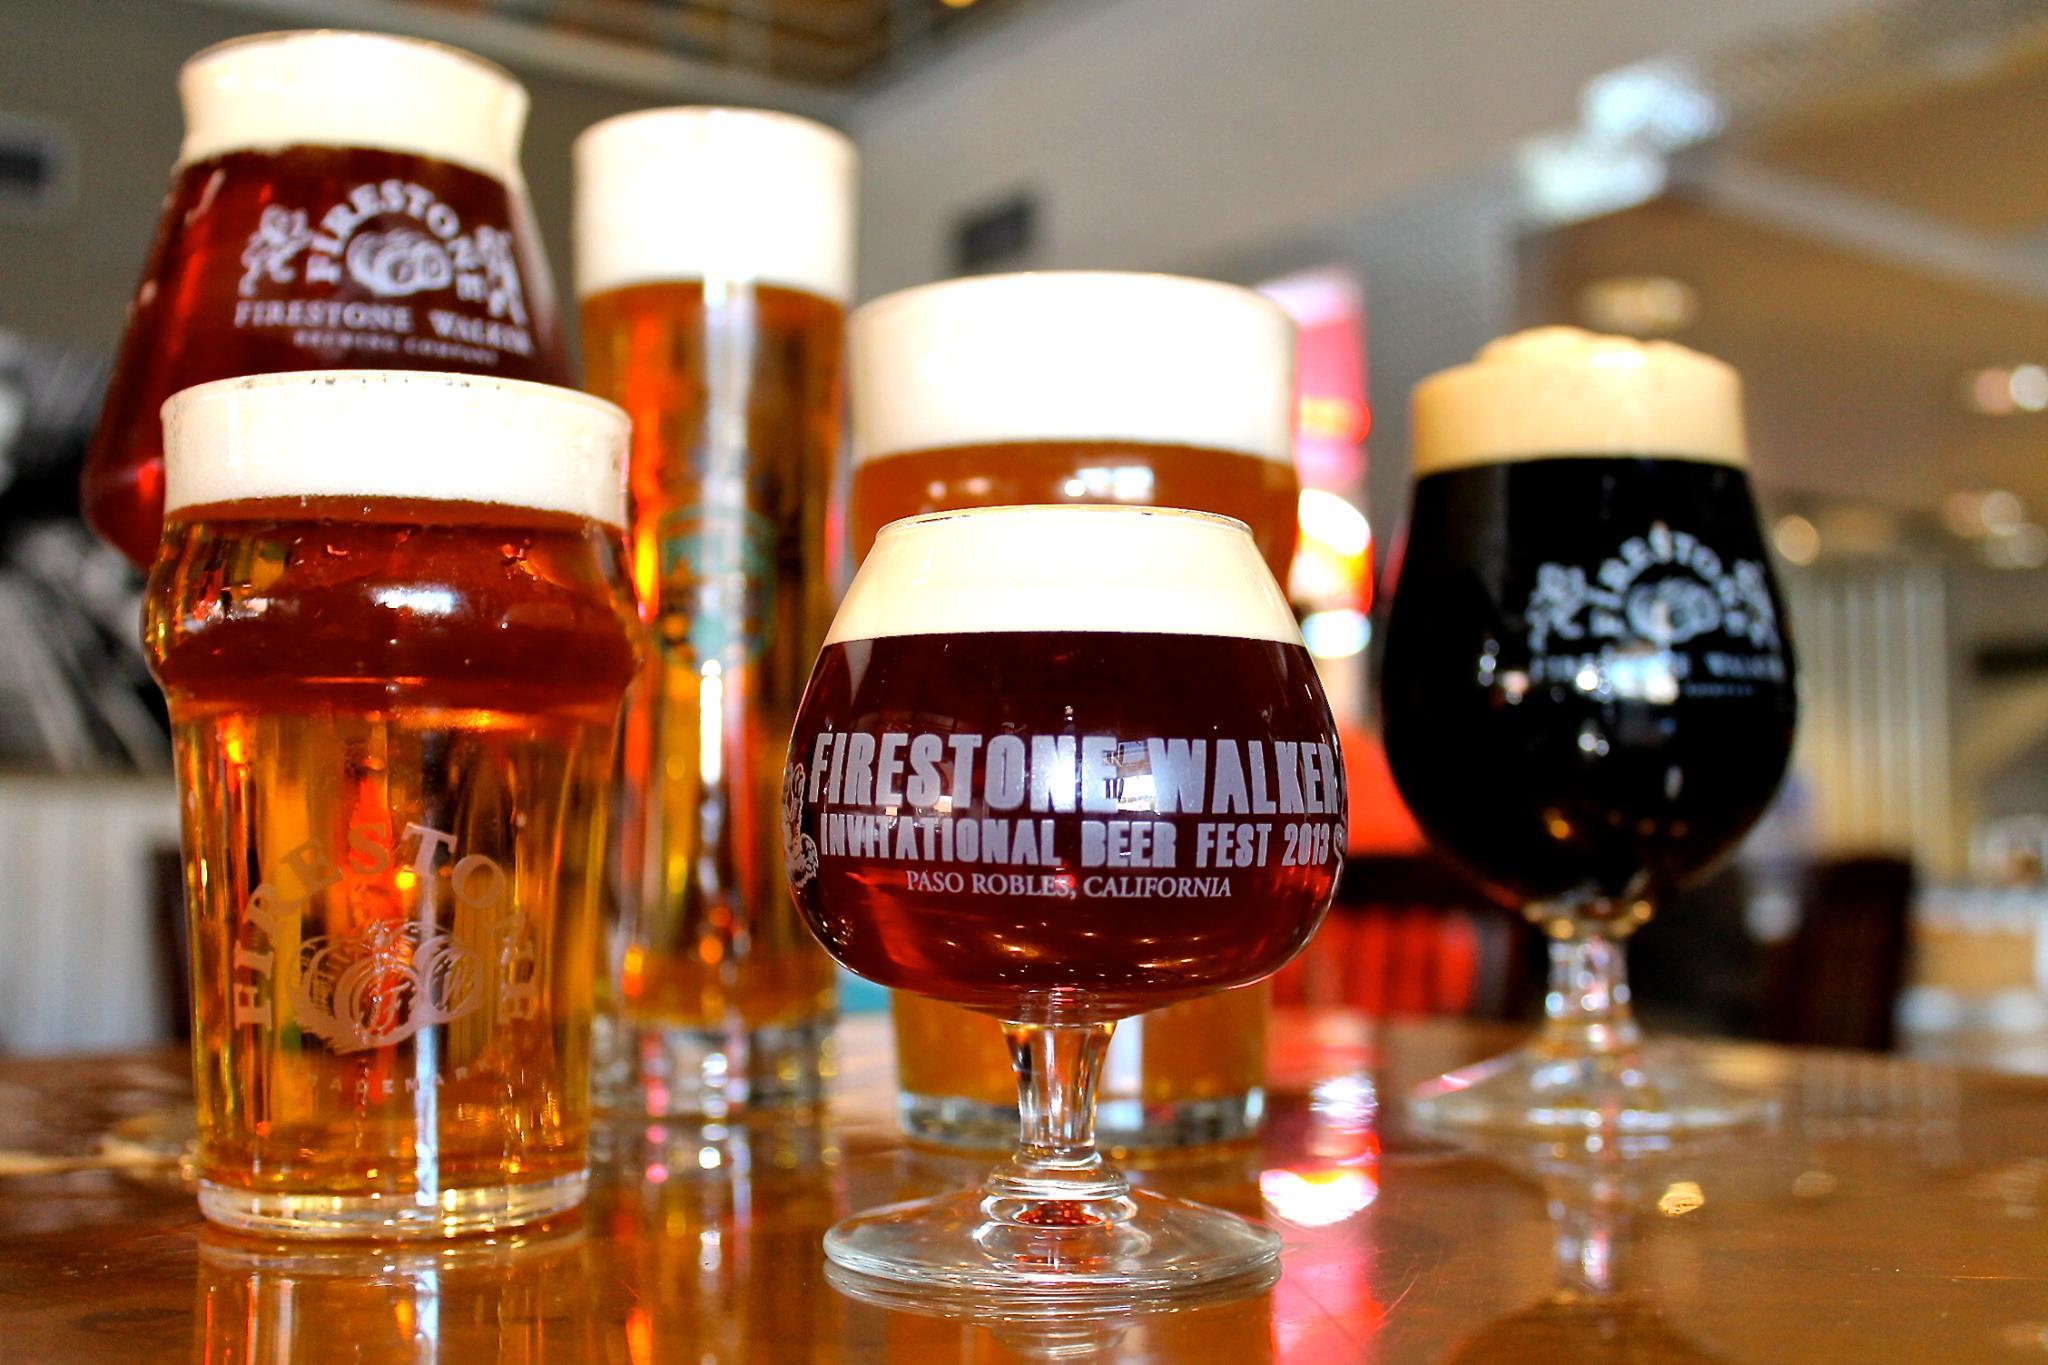 2014 Firestone Walker Invitational Beer Festival